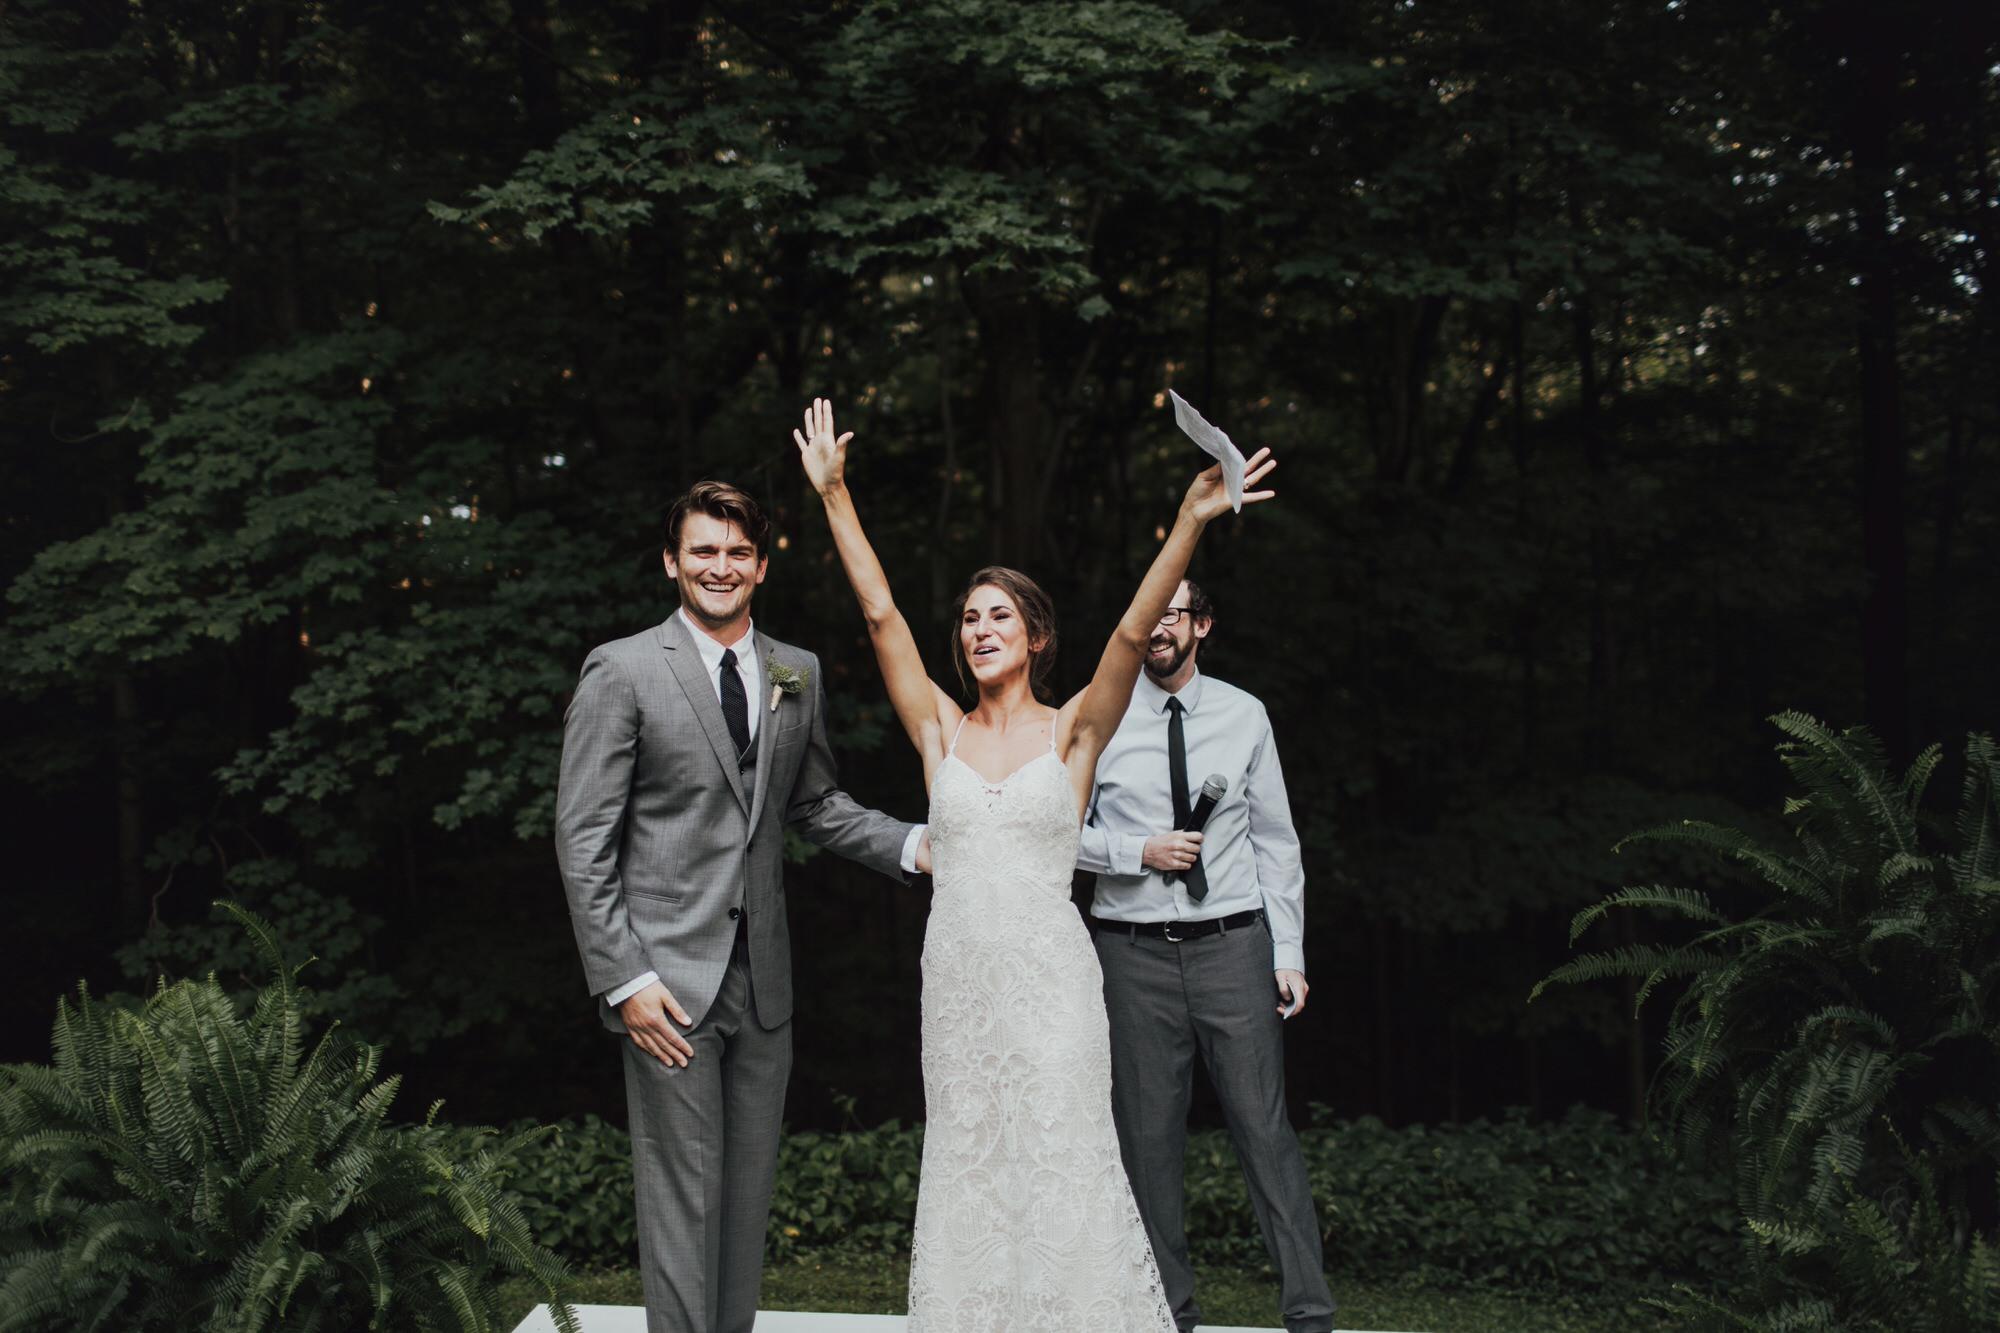 emily-aaron-rochester-new-york-wedding-photographer-77.JPG